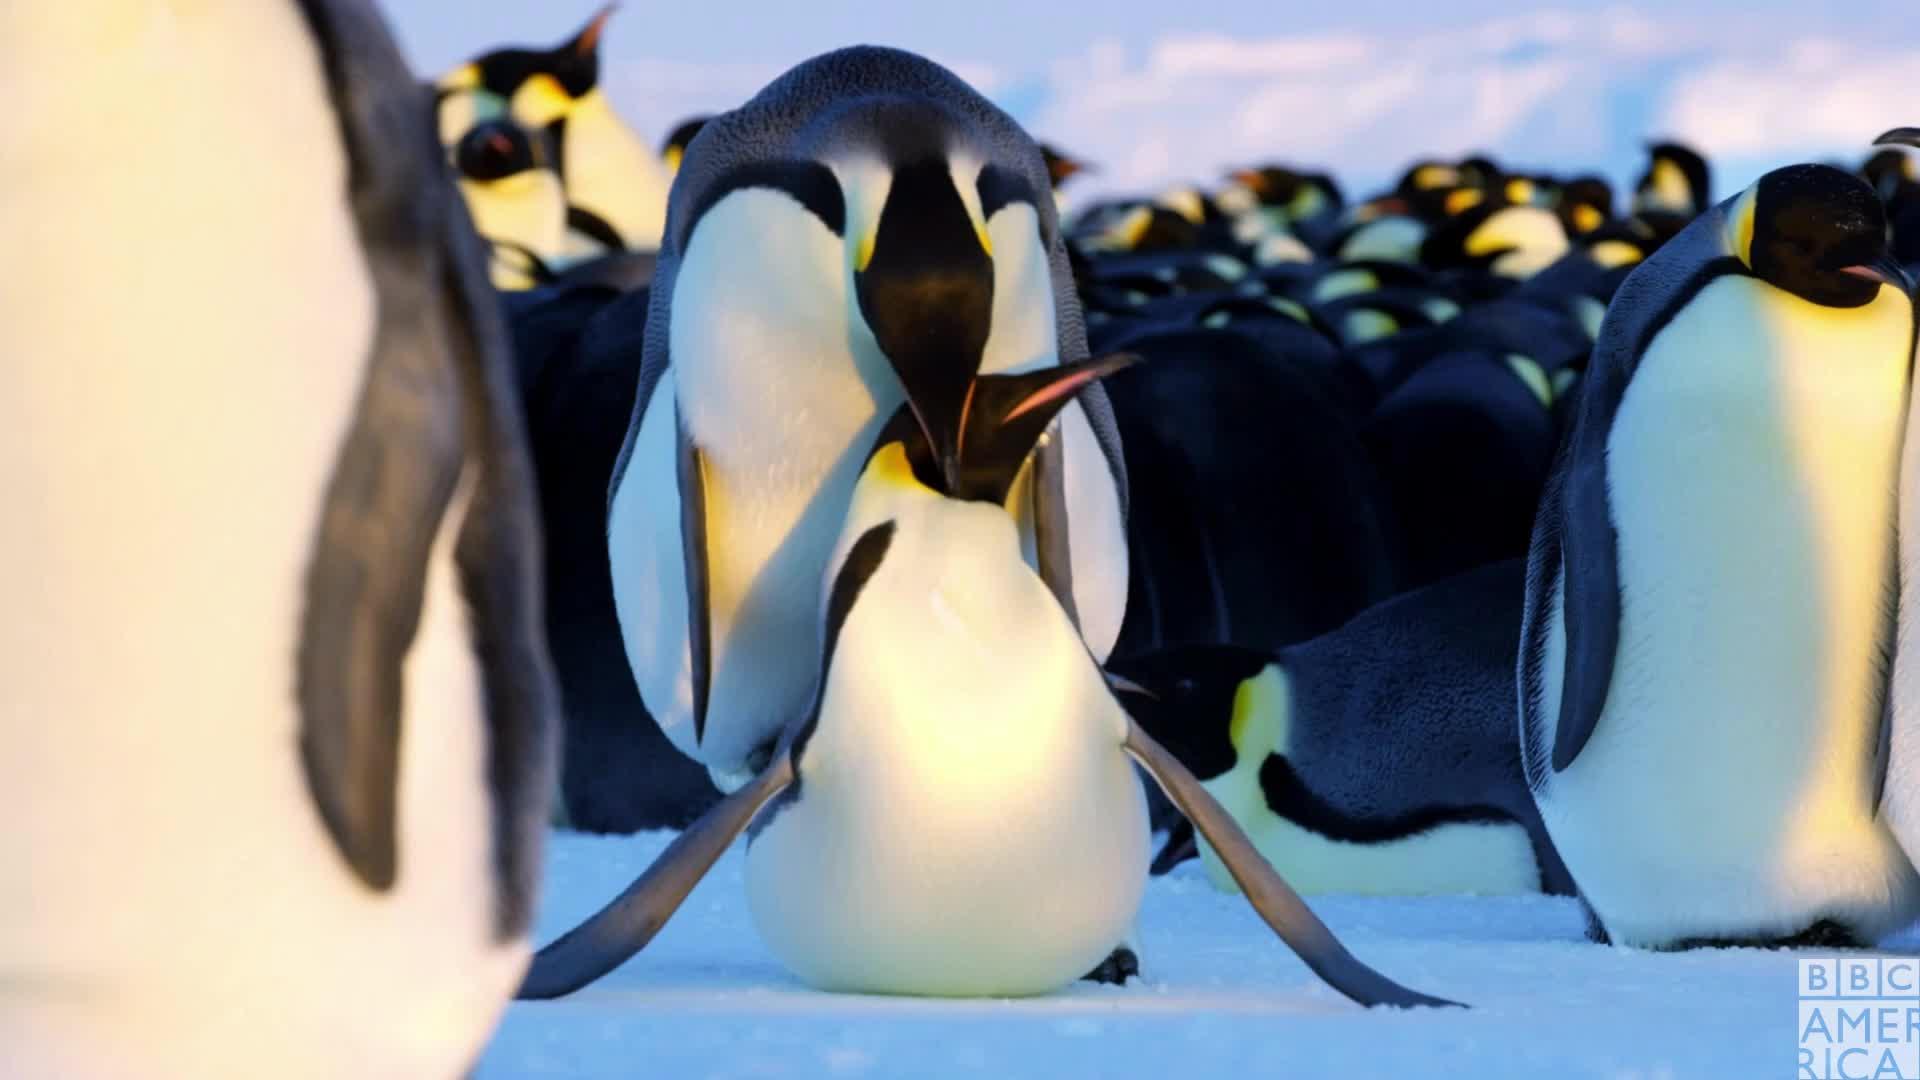 animal, animals, bbc america, bbc america dynasties, bbc america: dynasties, dynasties, emperor penguin, emperor penguins, funny, penguin, penguins, sex, Dynasties Penguin Sex Fun GIFs